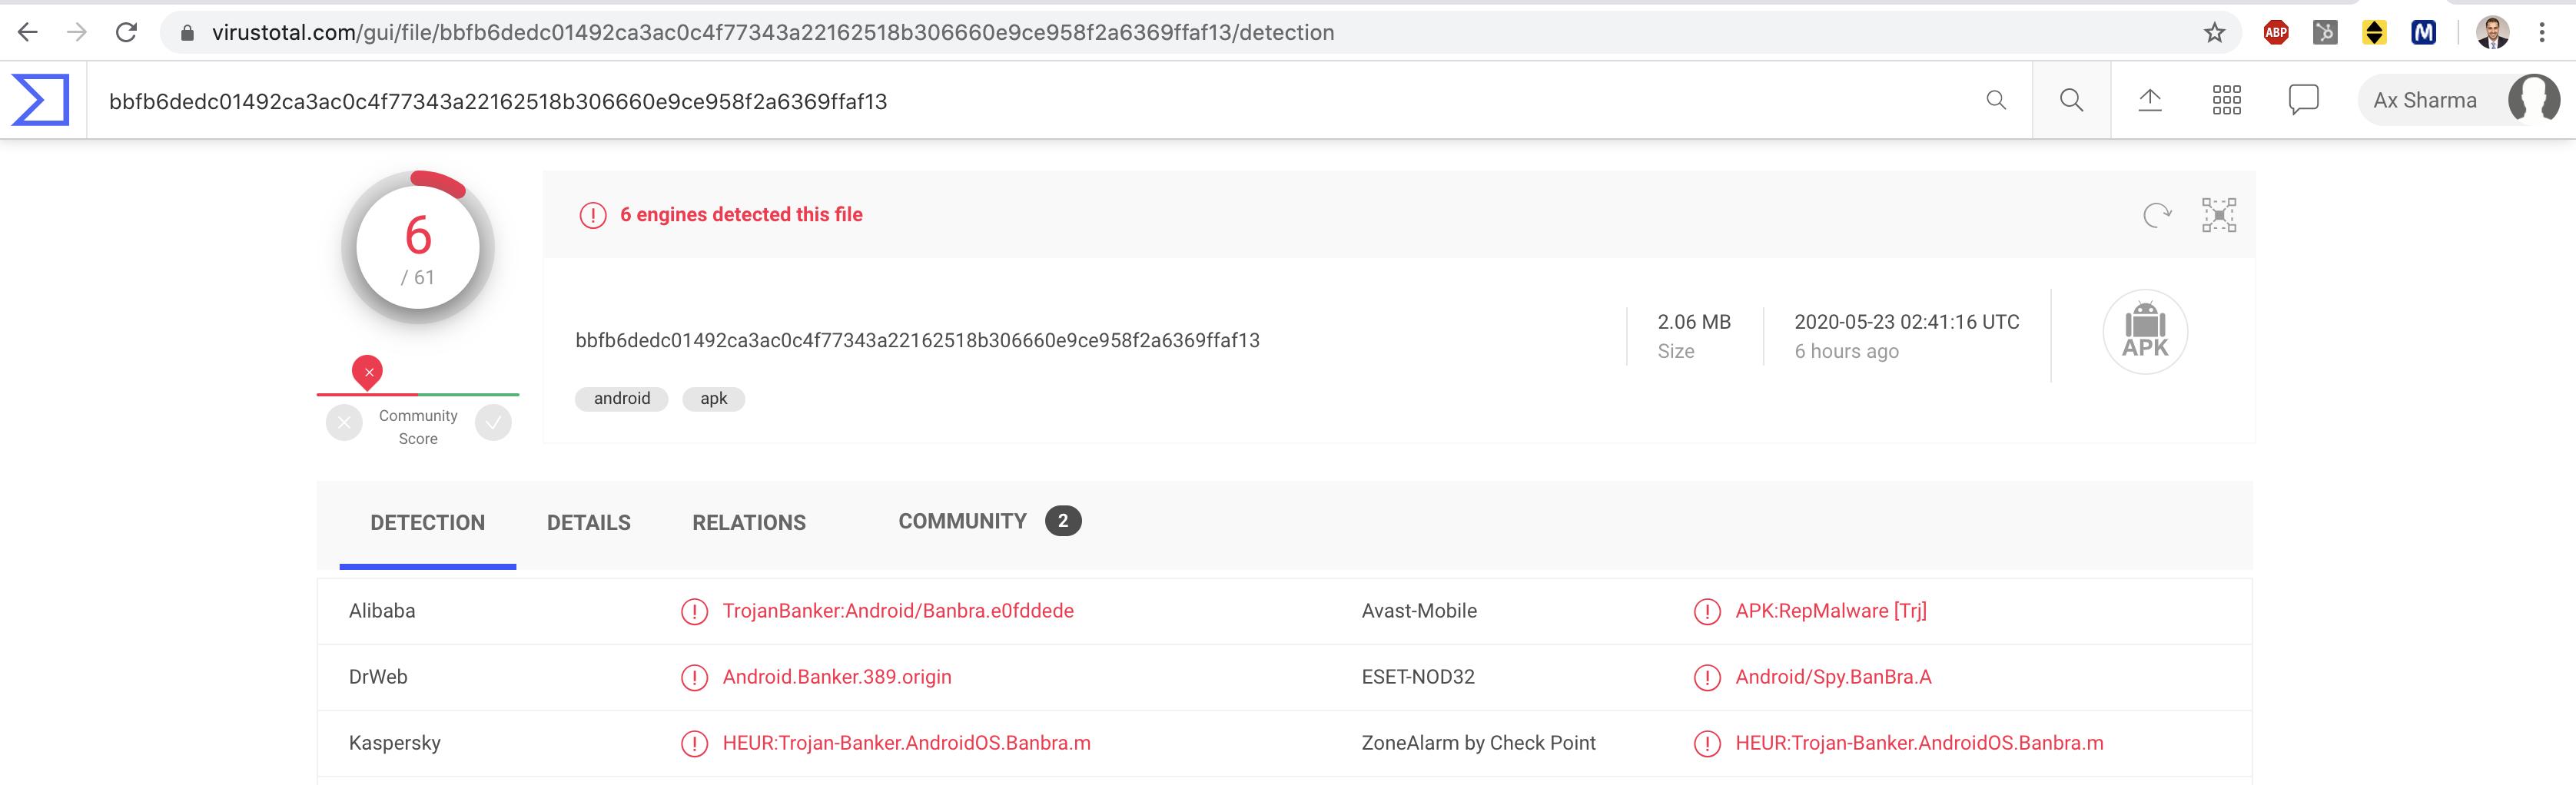 VirusTotal definitions for Defensor Android malware